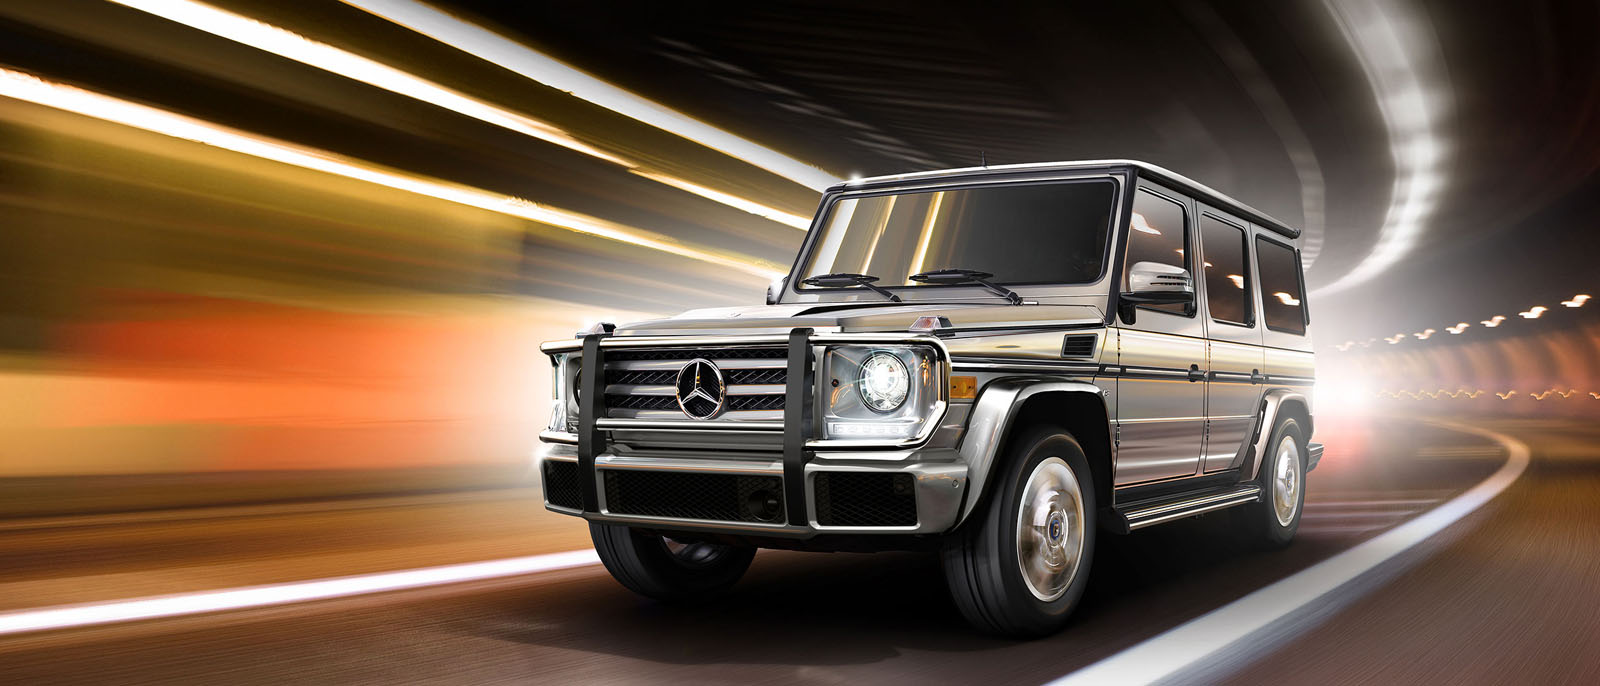 2016 mercedes benz g550 silver star montr al for Mercedes benz silver star